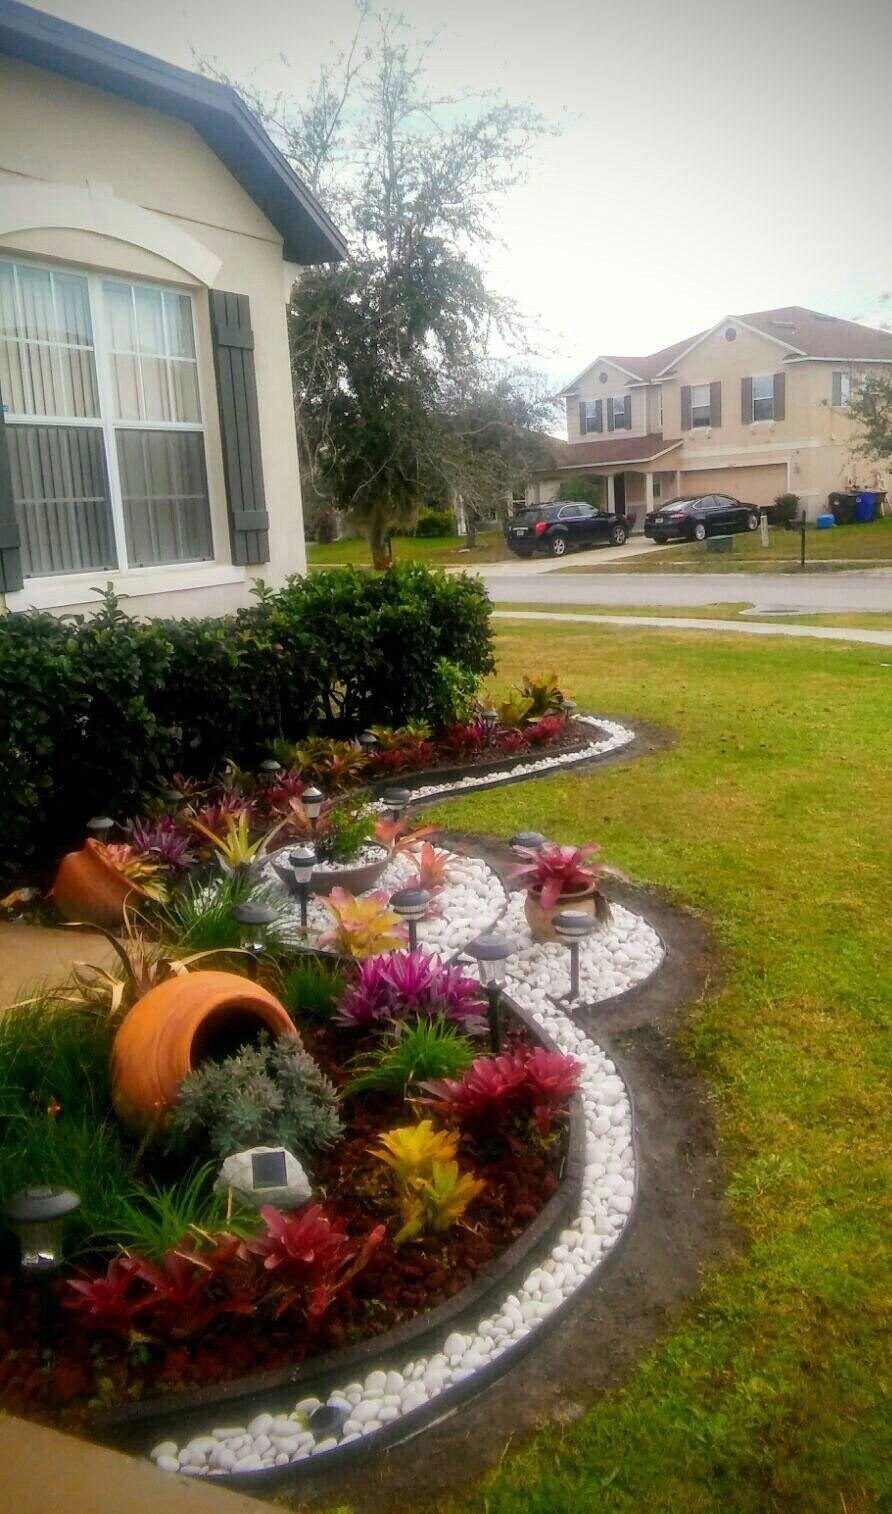 Amazing Small Front Yard Landscaping Ideas Low Maintenance Frontyardlandscapingideas Bac Front Yard Landscaping Design Yard Landscaping Backyard Landscaping